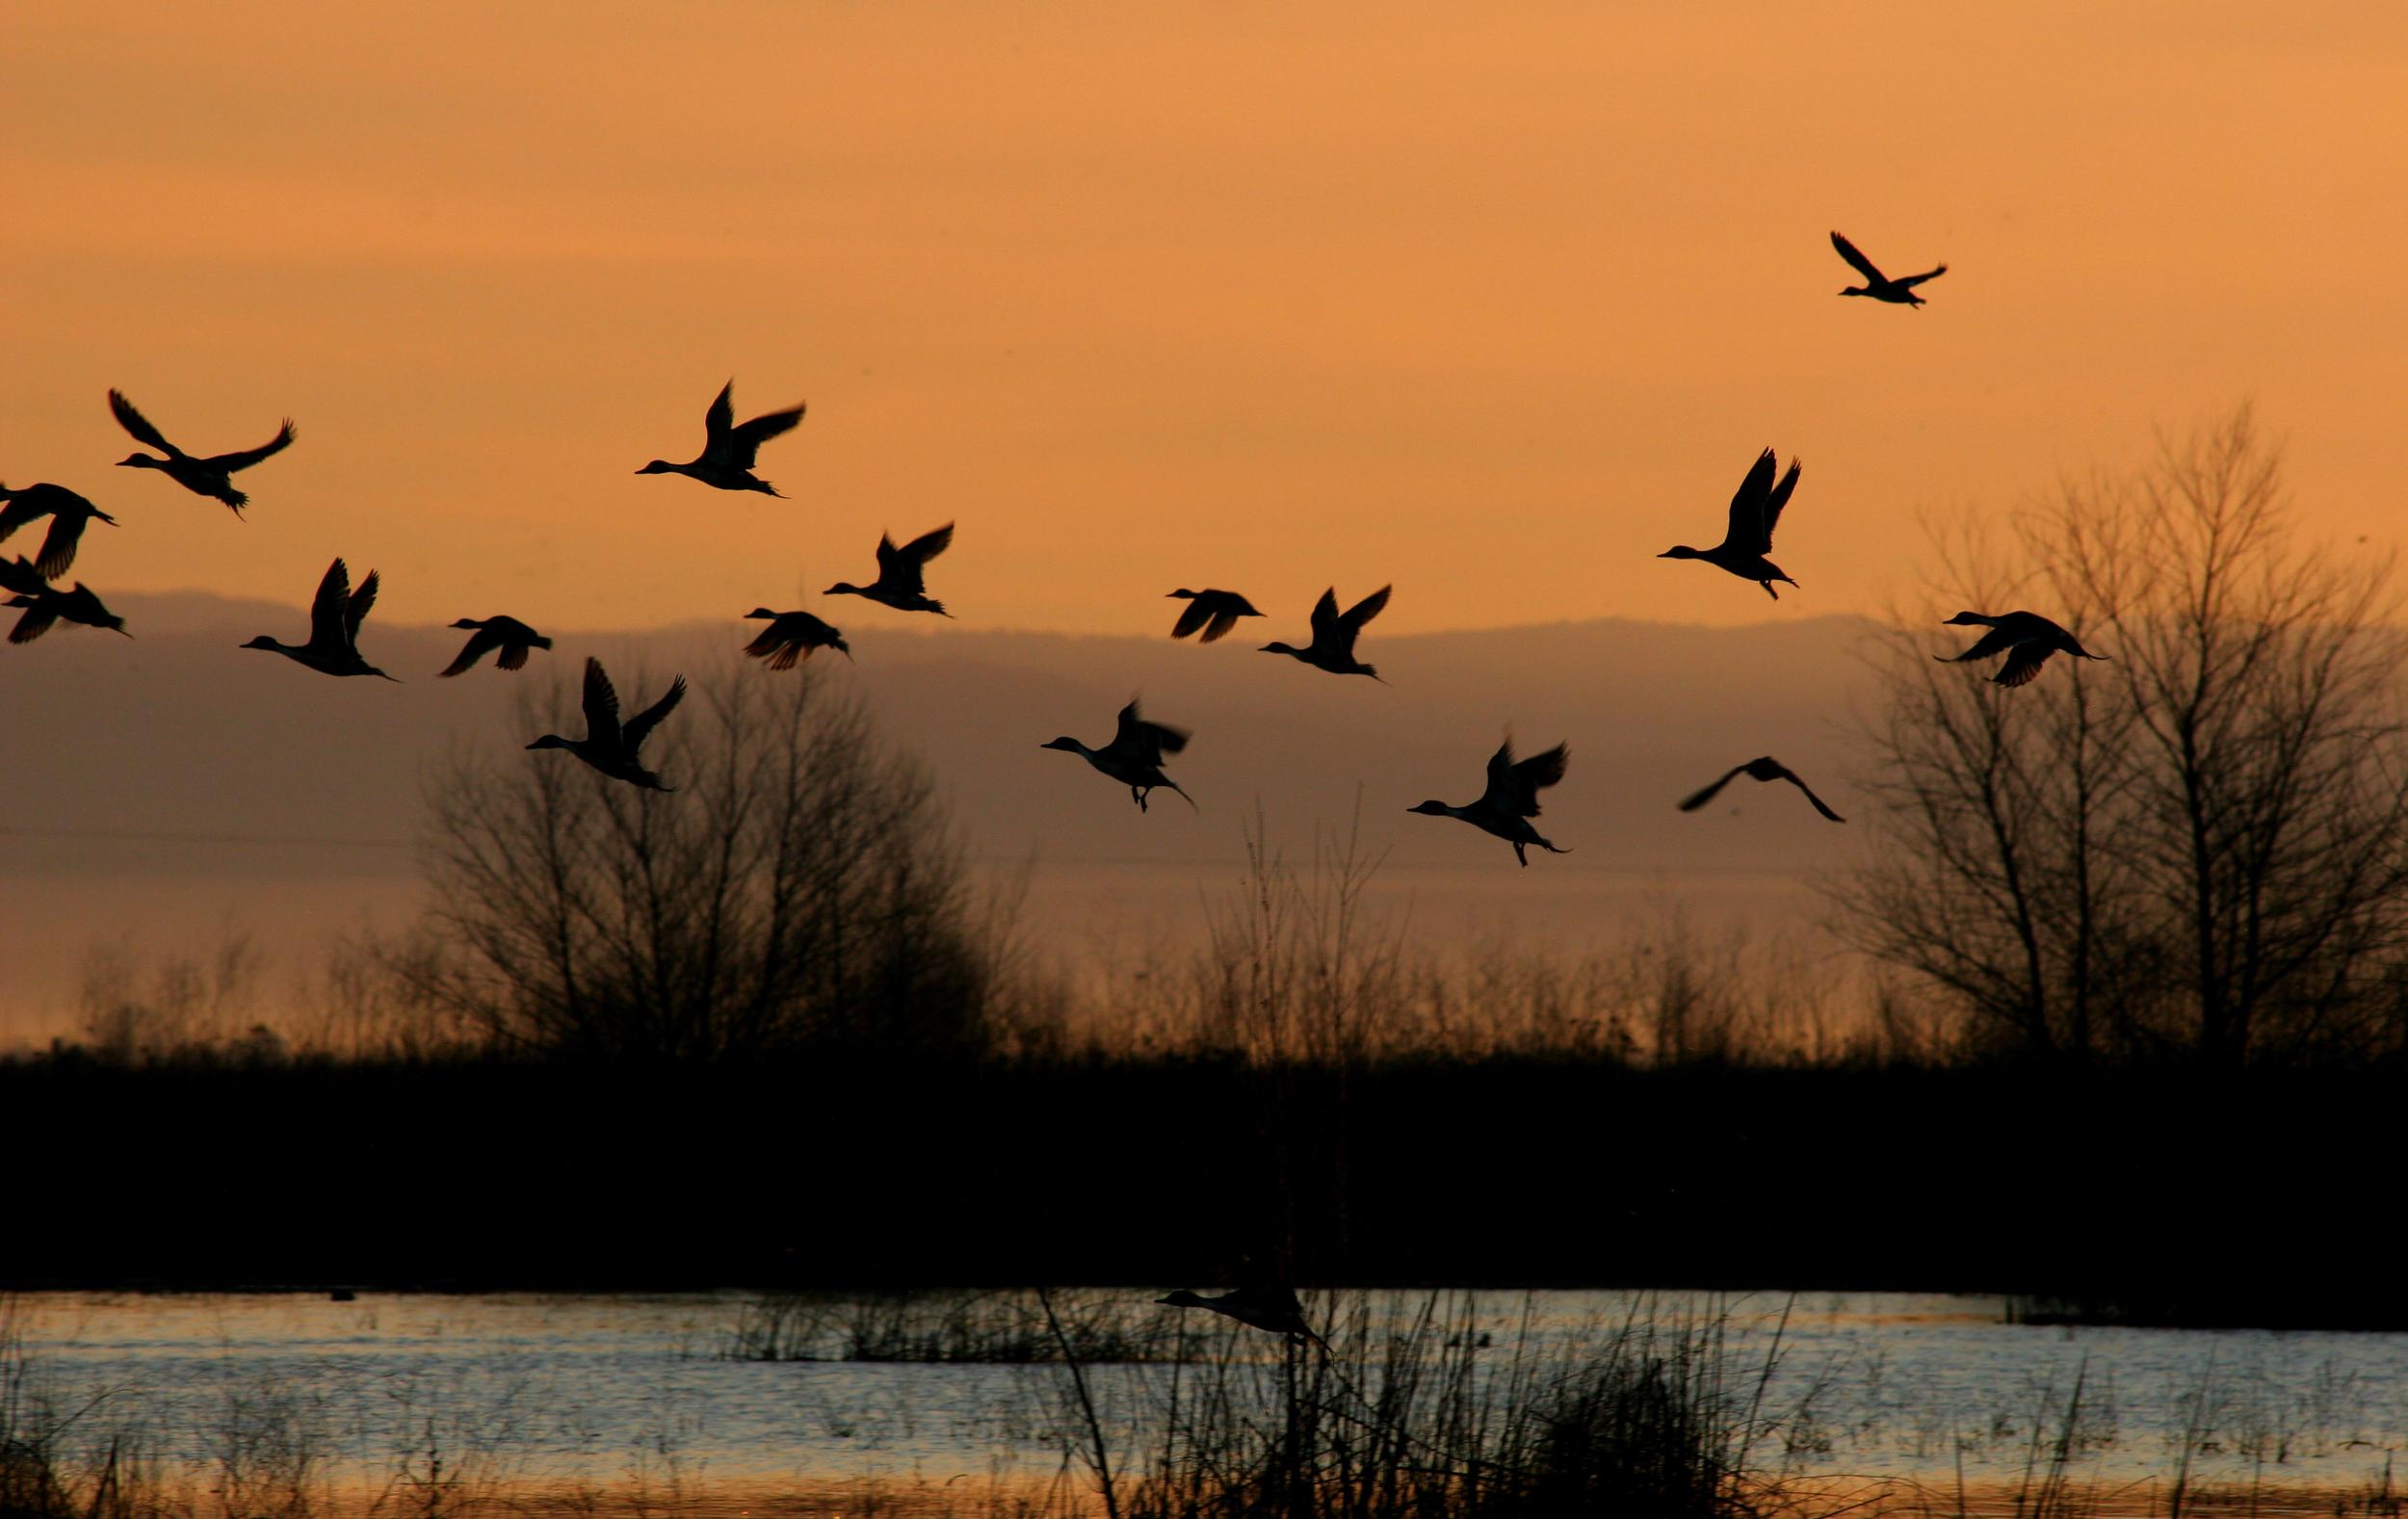 Sunrise at the wetland.